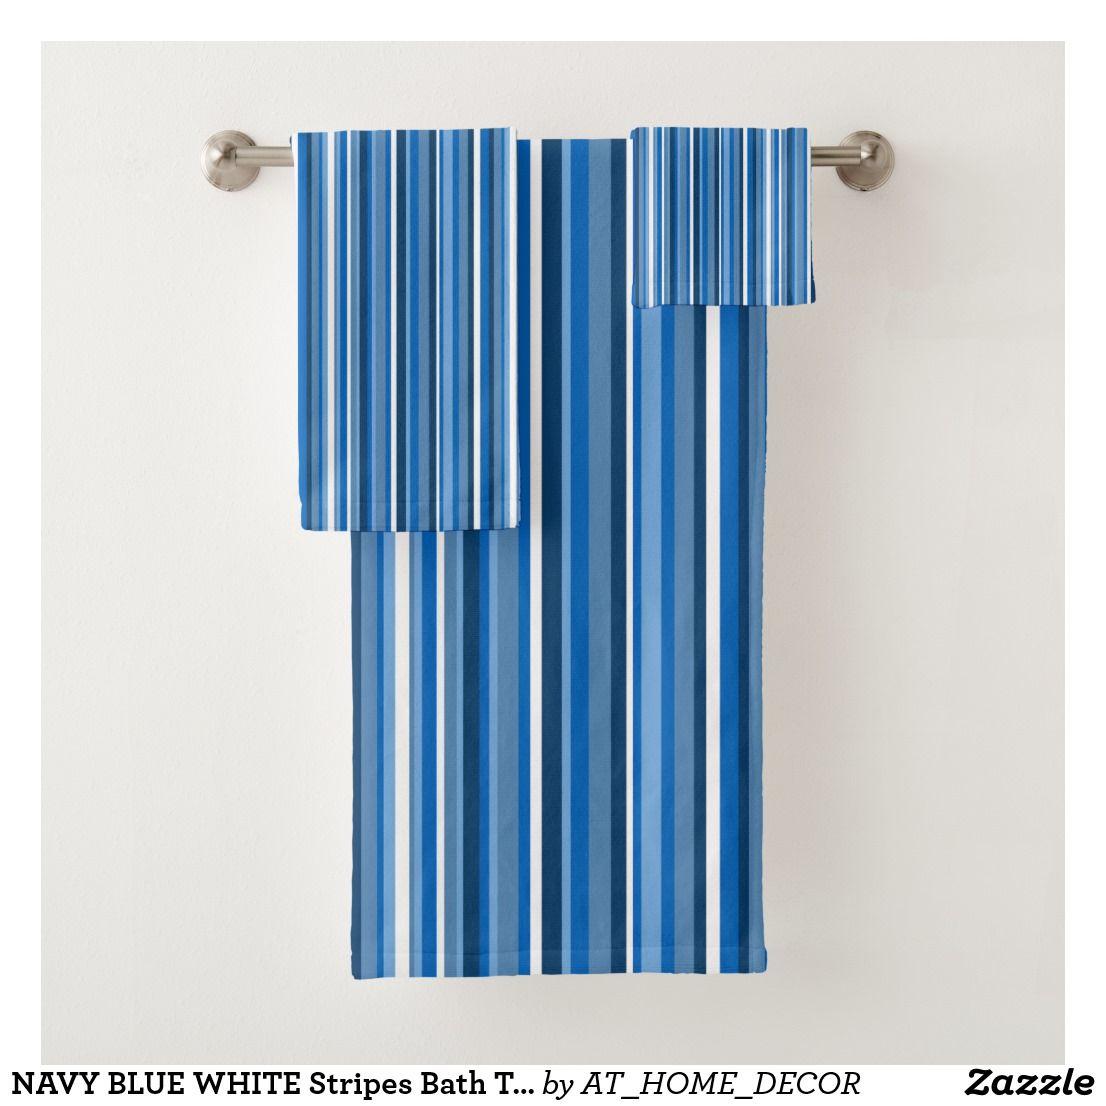 Navy Blue White Stripes Bath Towel Set Zazzle Com Striped Bath Towels Blue Bathroom Accessories Home Decor